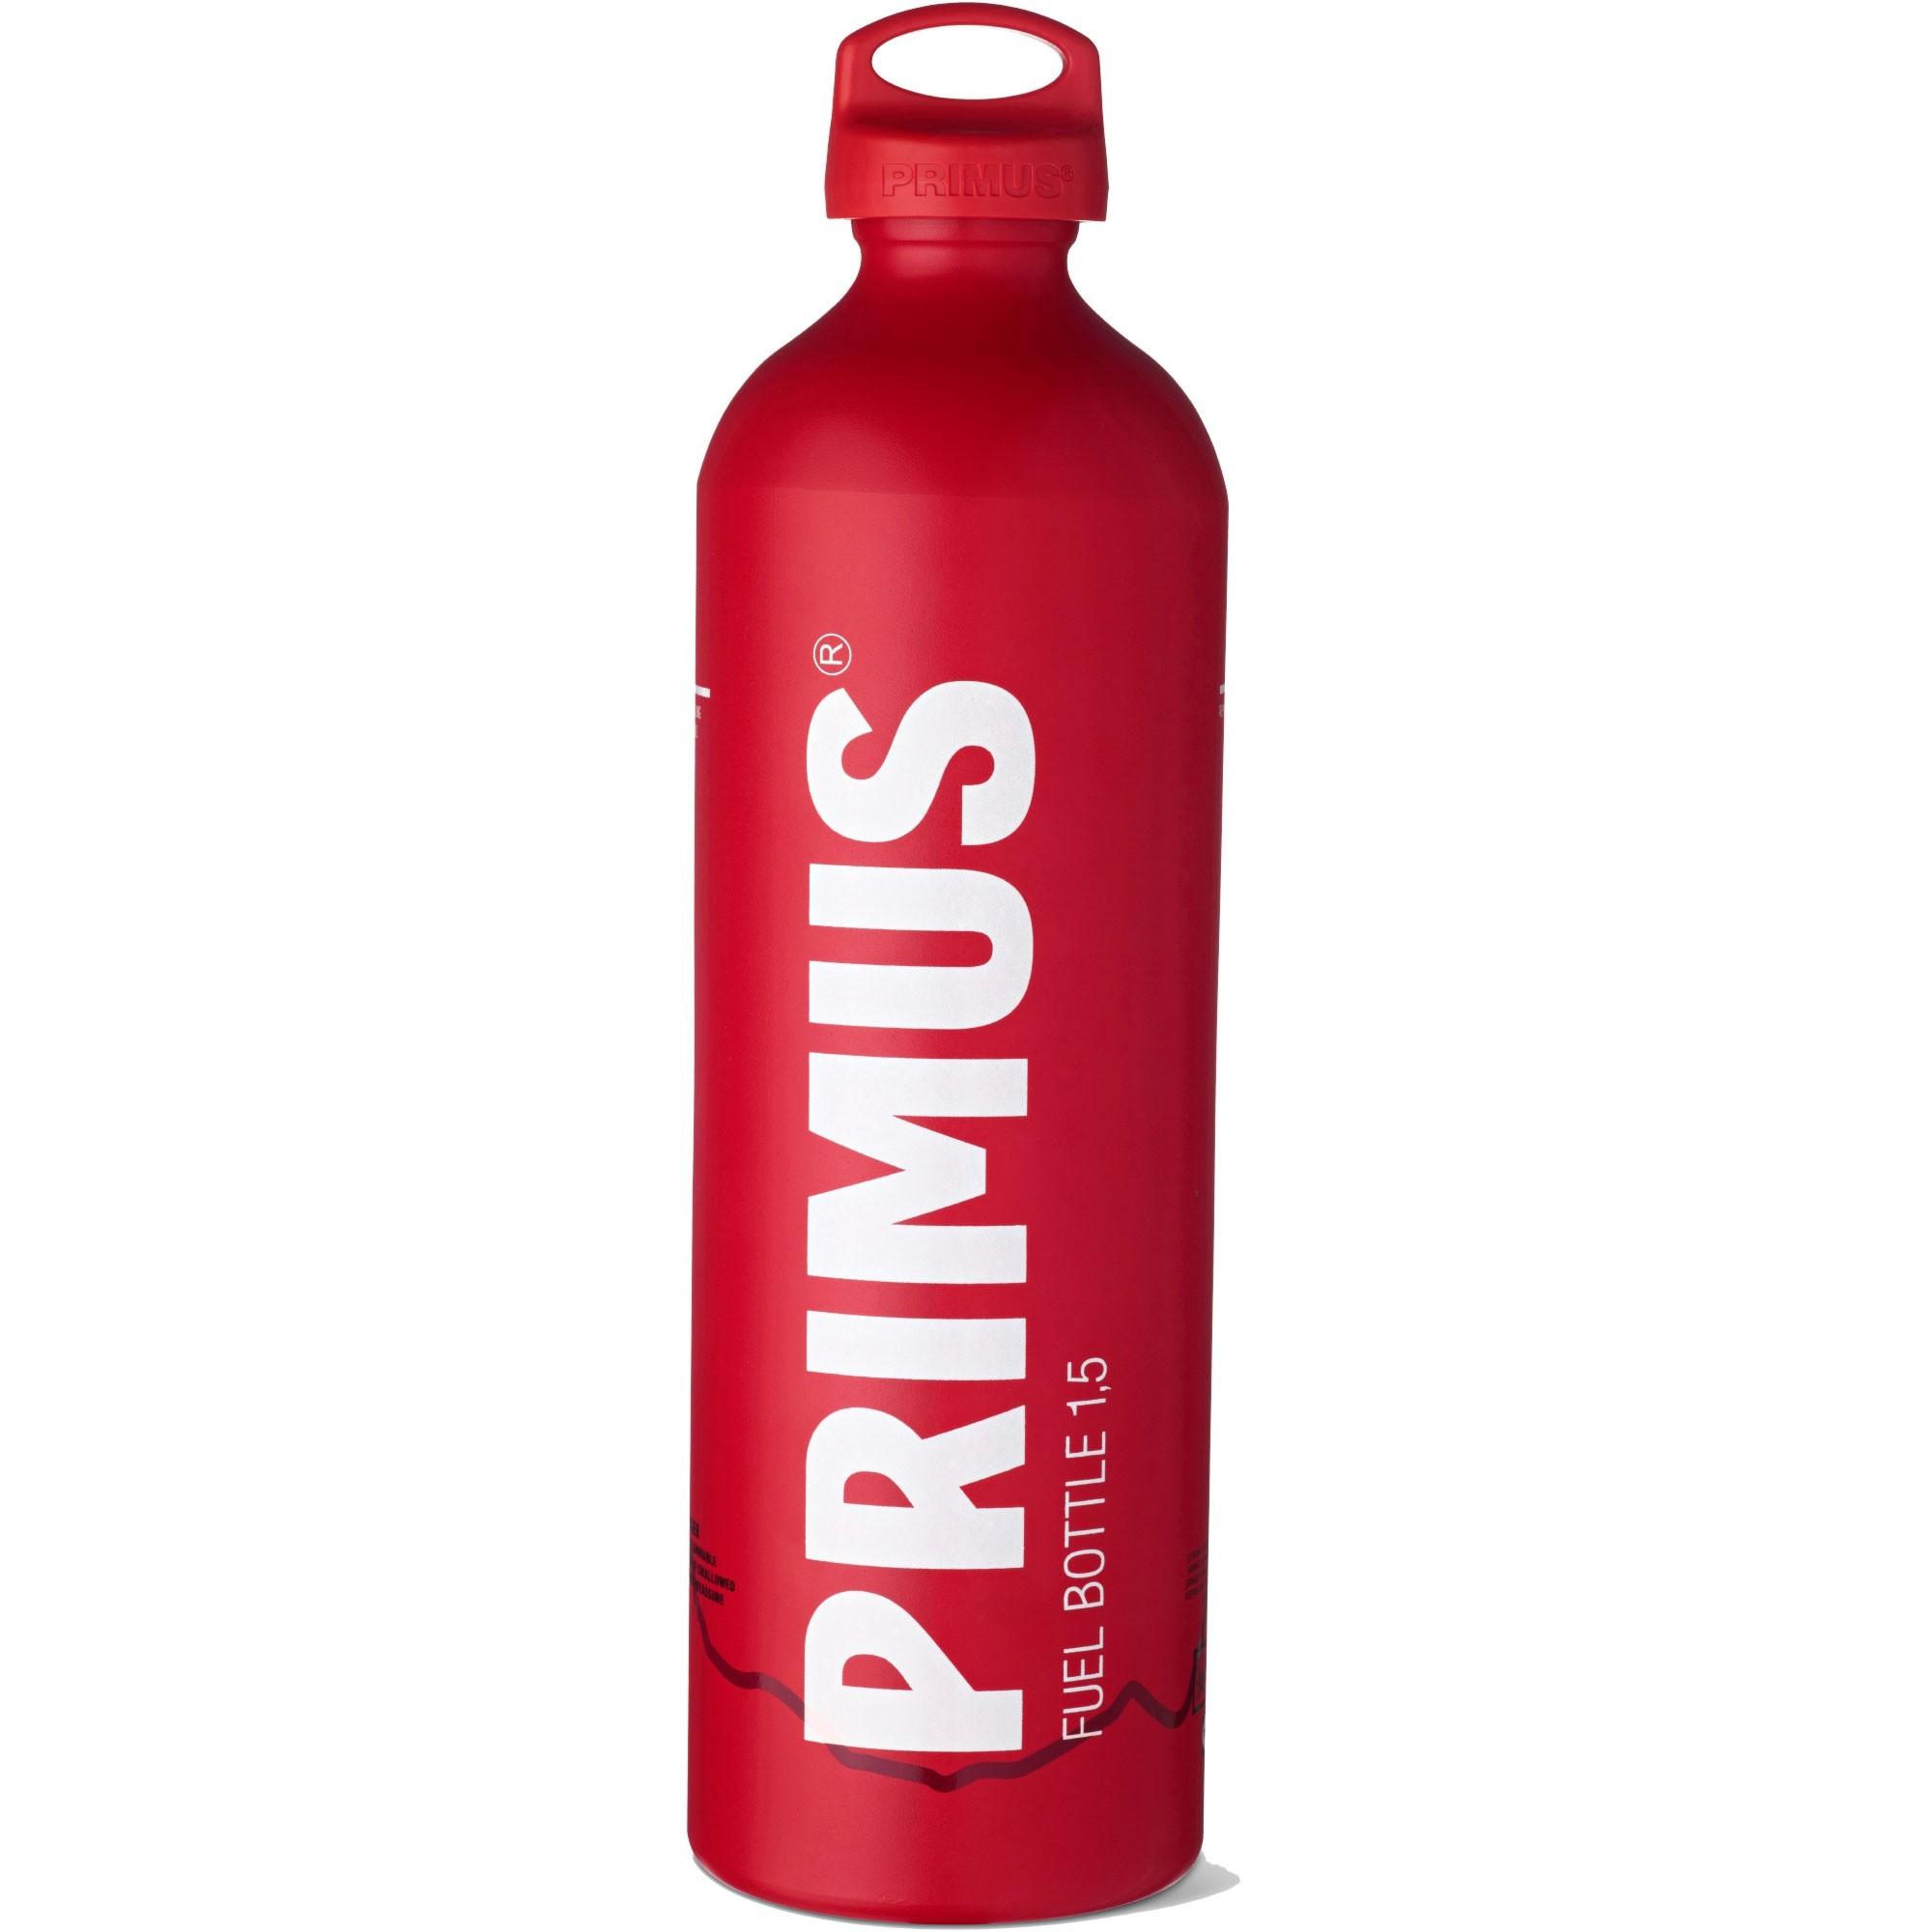 Primus Fuel Bottle with Child-Proof Cap - 1.5L